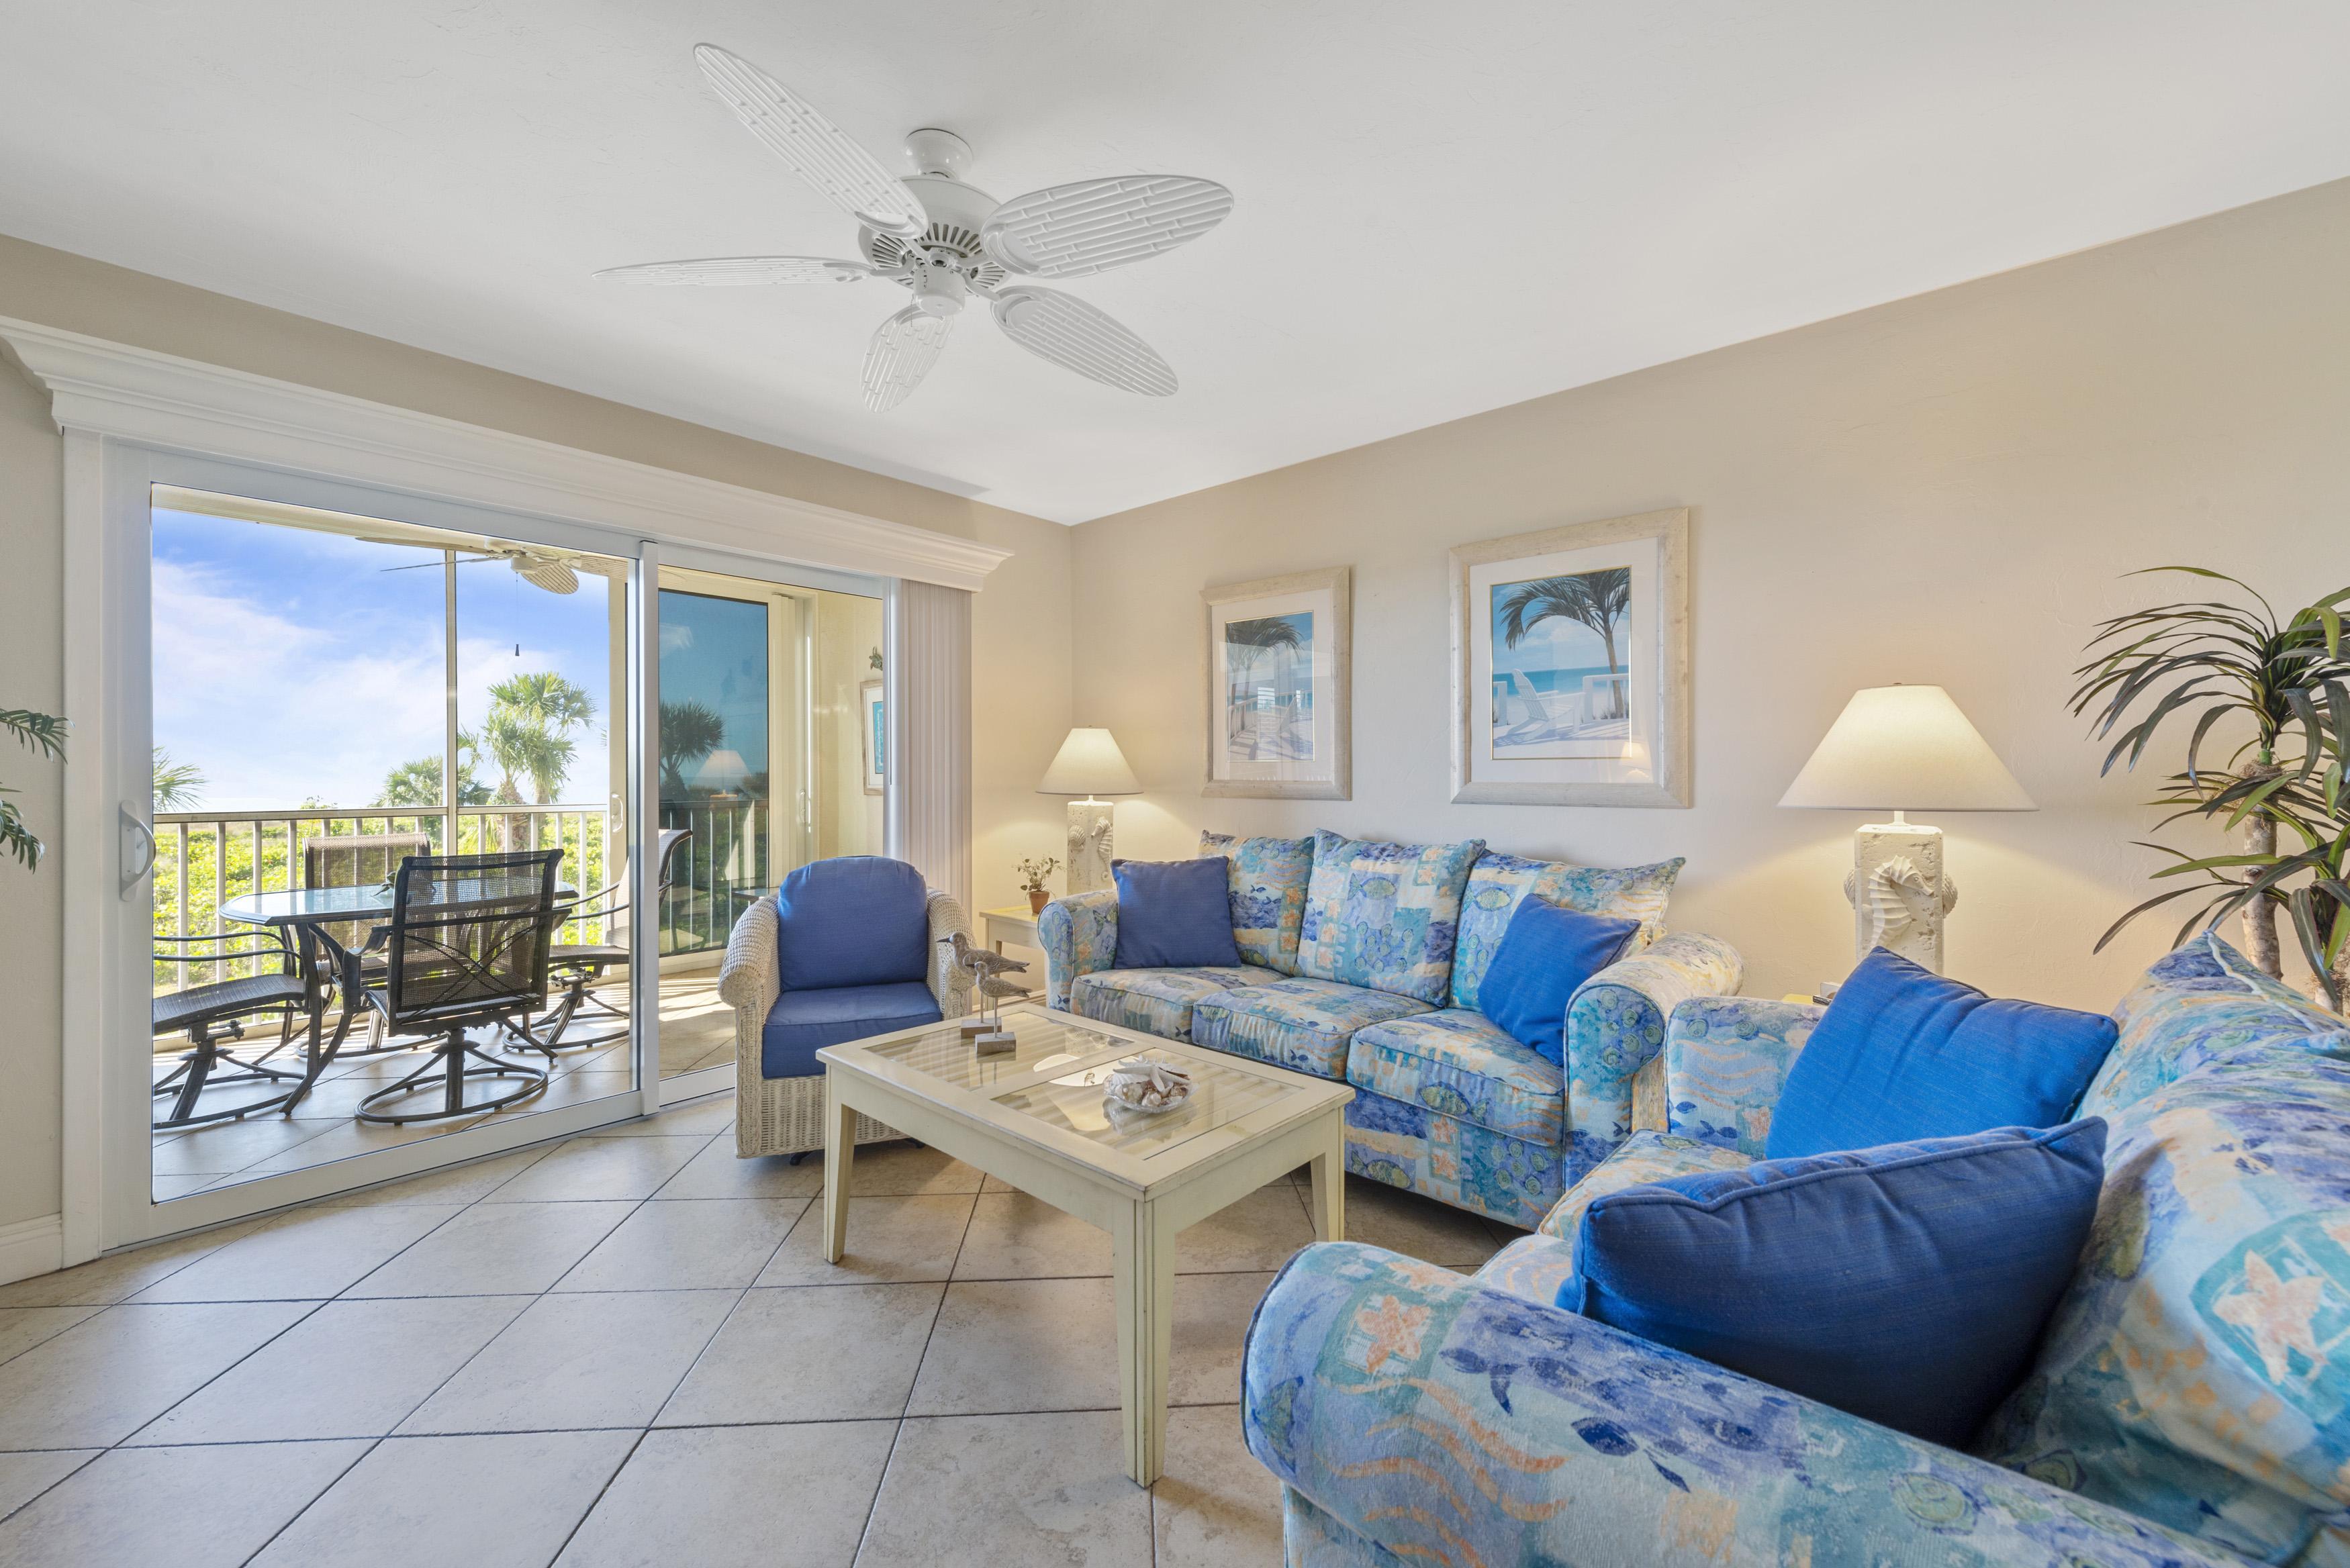 Sanibel Island Rental Condo Family Room